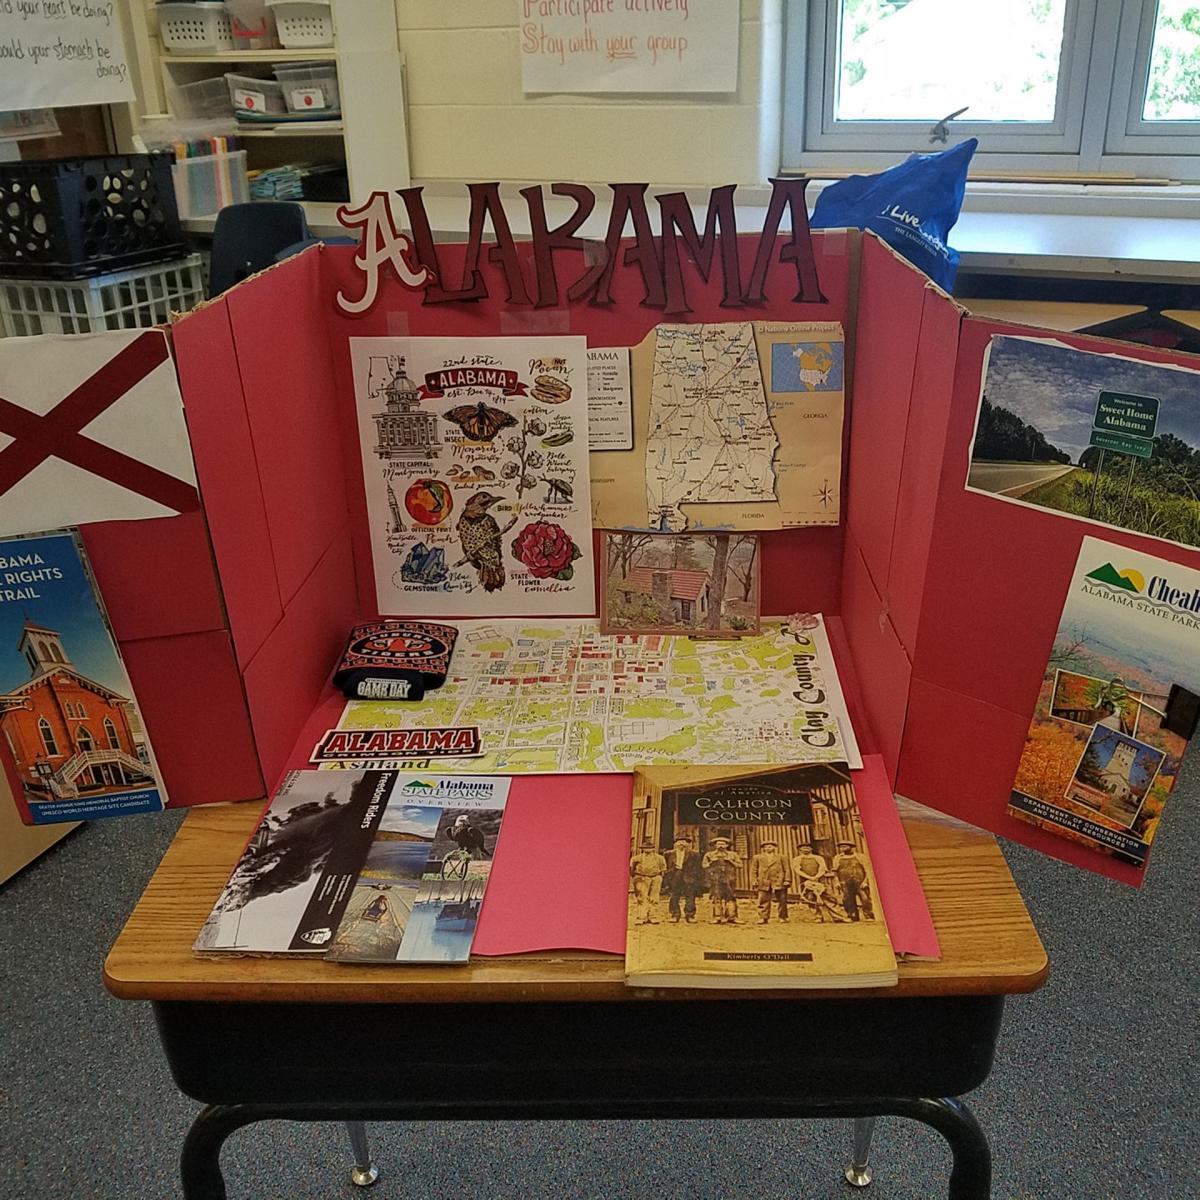 In Your Community ... Virginia school students create display of Alabama